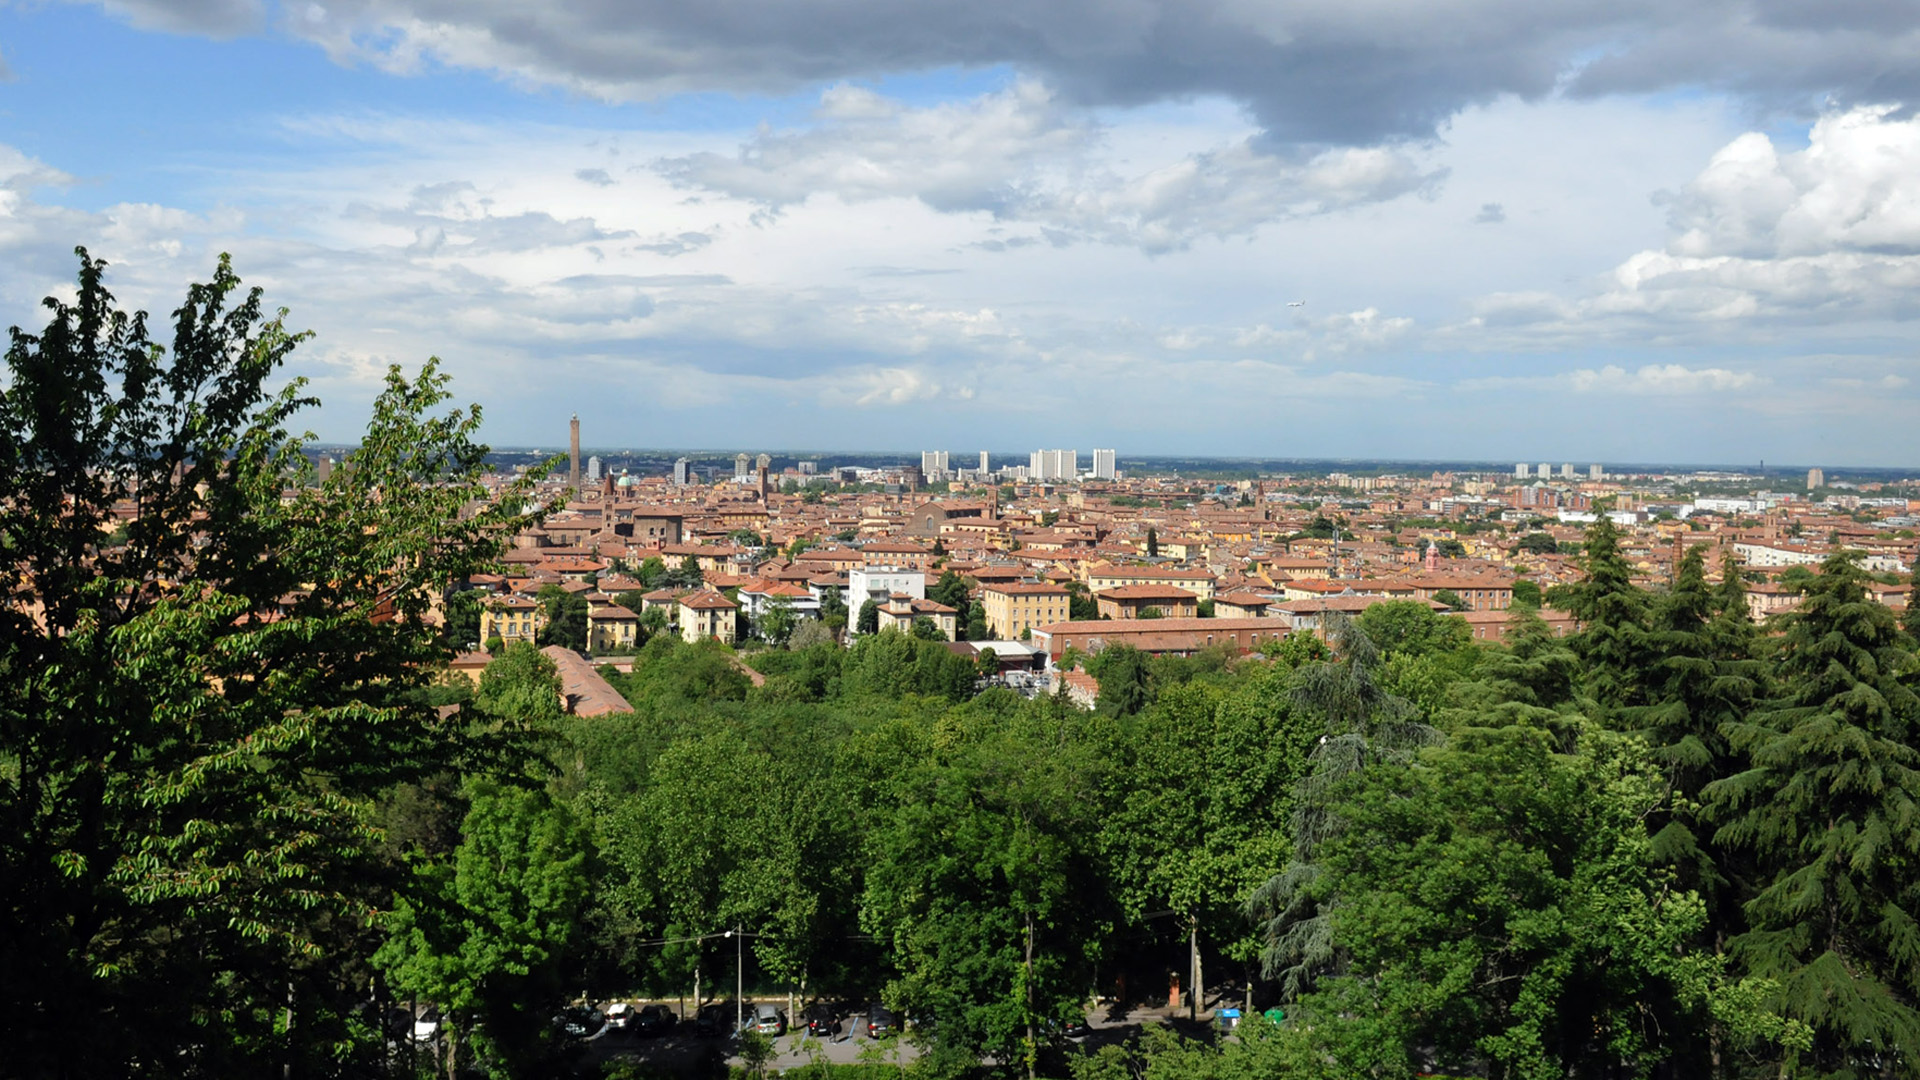 Interventi strategici: via libera ai 110 milioni di euro destinati a Comune e Città metropolitana